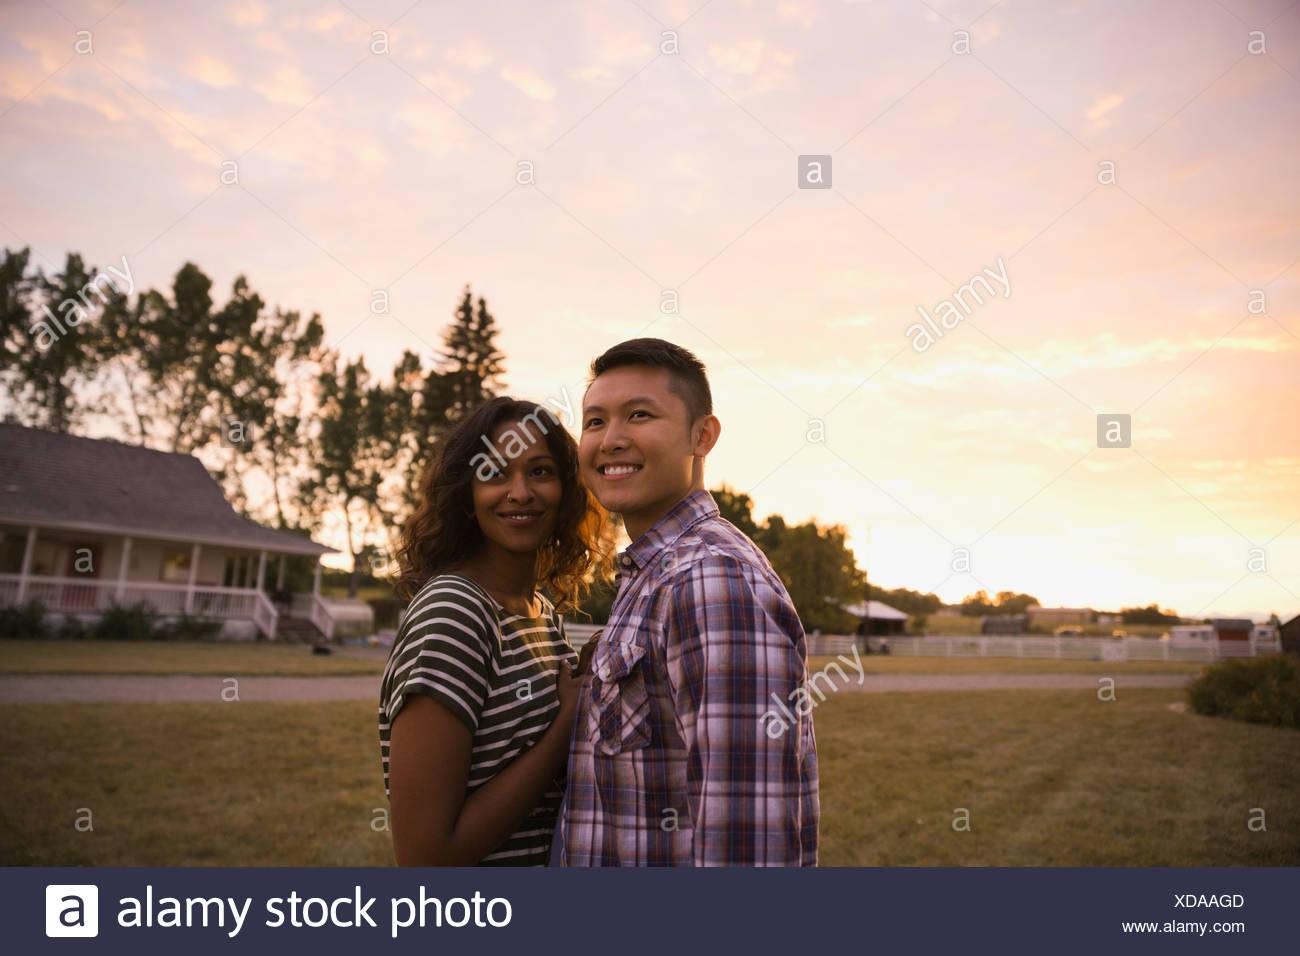 Portrait de multi-ethnic couple standing outdoors Photo Stock